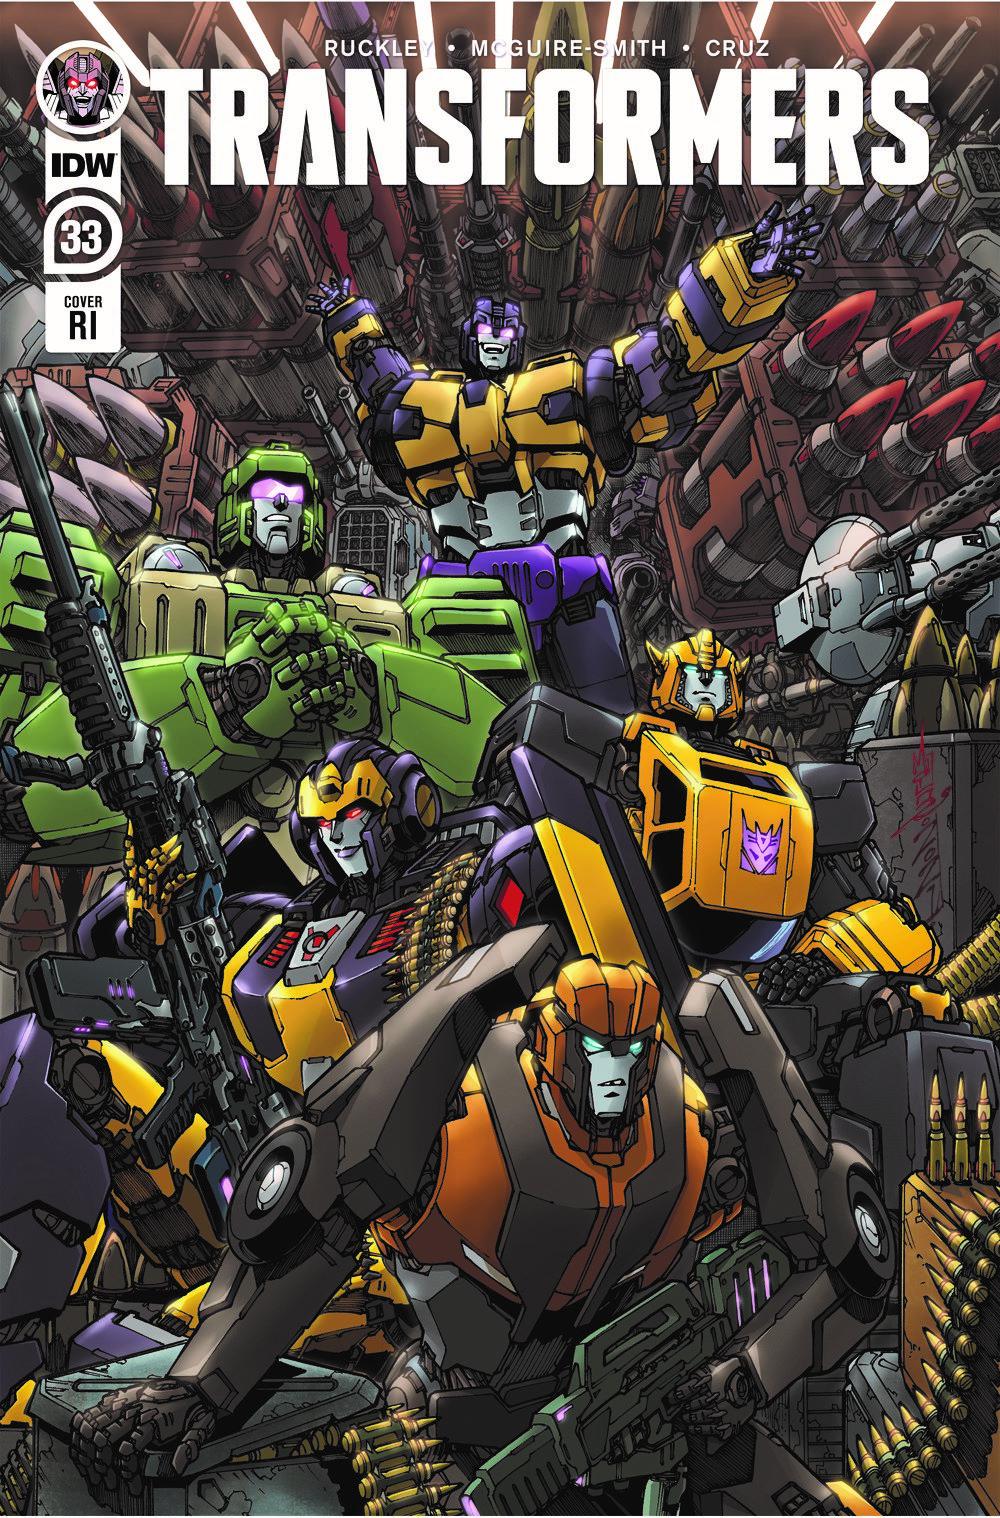 TF33-cvr-RI ComicList: IDW Publishing New Releases for 08/04/2021